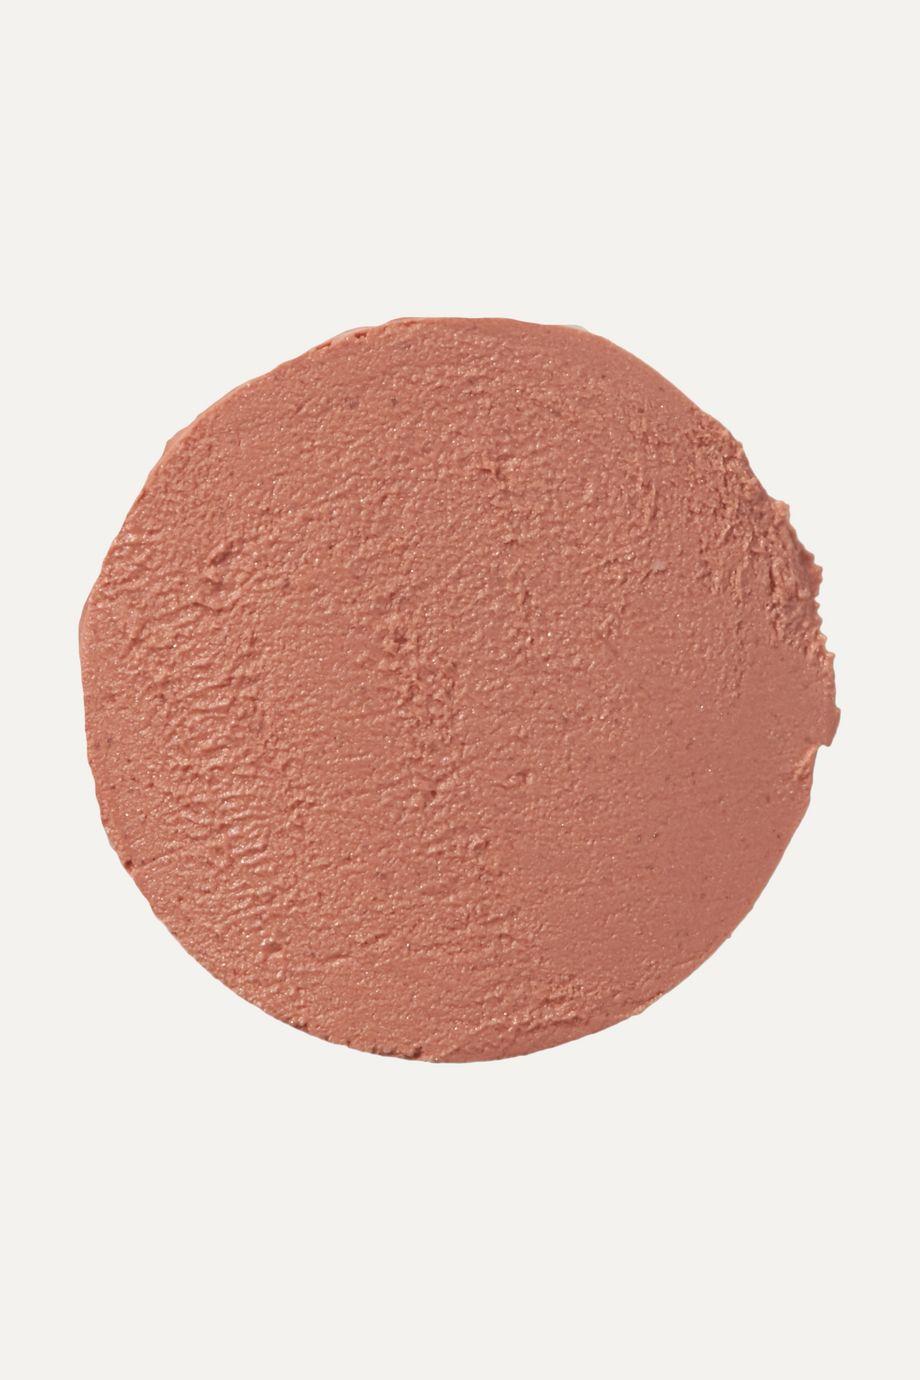 Burberry Beauty Full Kisses - Nude No.505